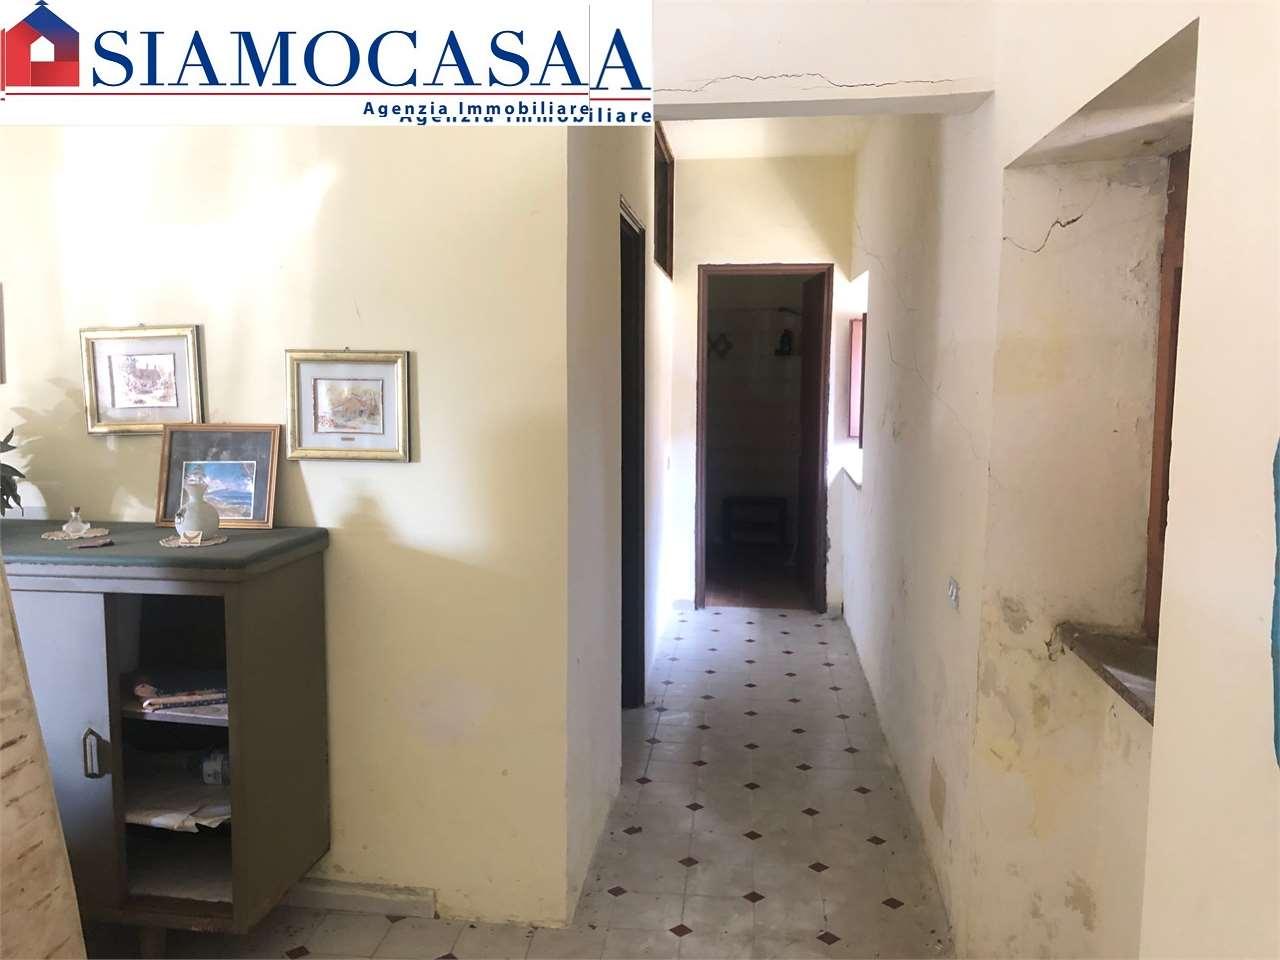 Vendita Casa Indipendente Casa/Villa Alessandria 135296